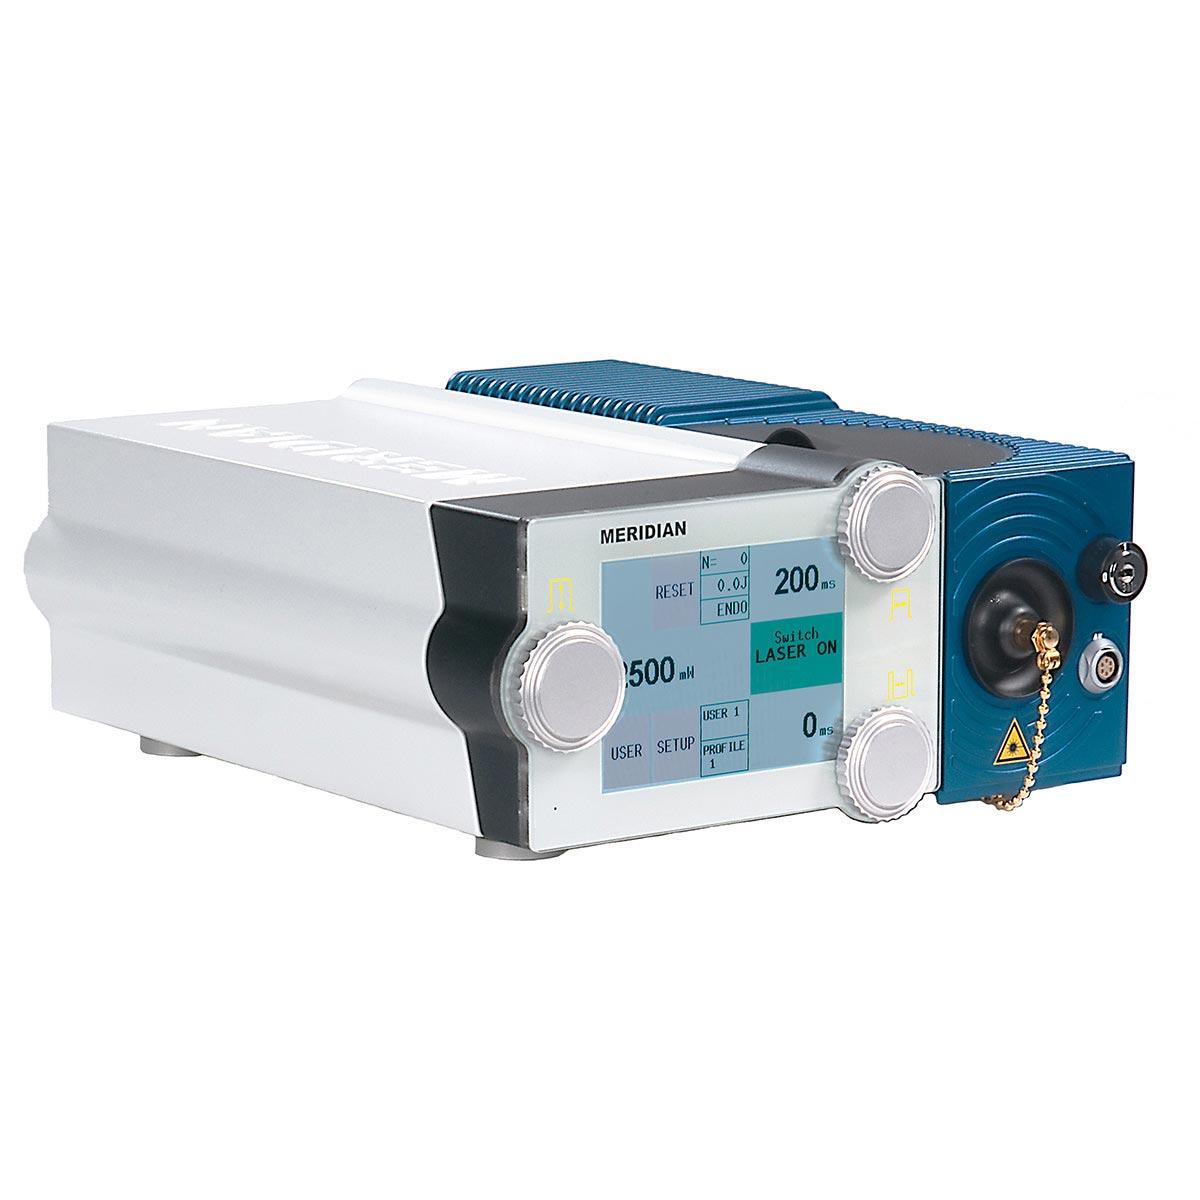 High Performance Laser for Retinal Photocoagulation Procedures and ALT